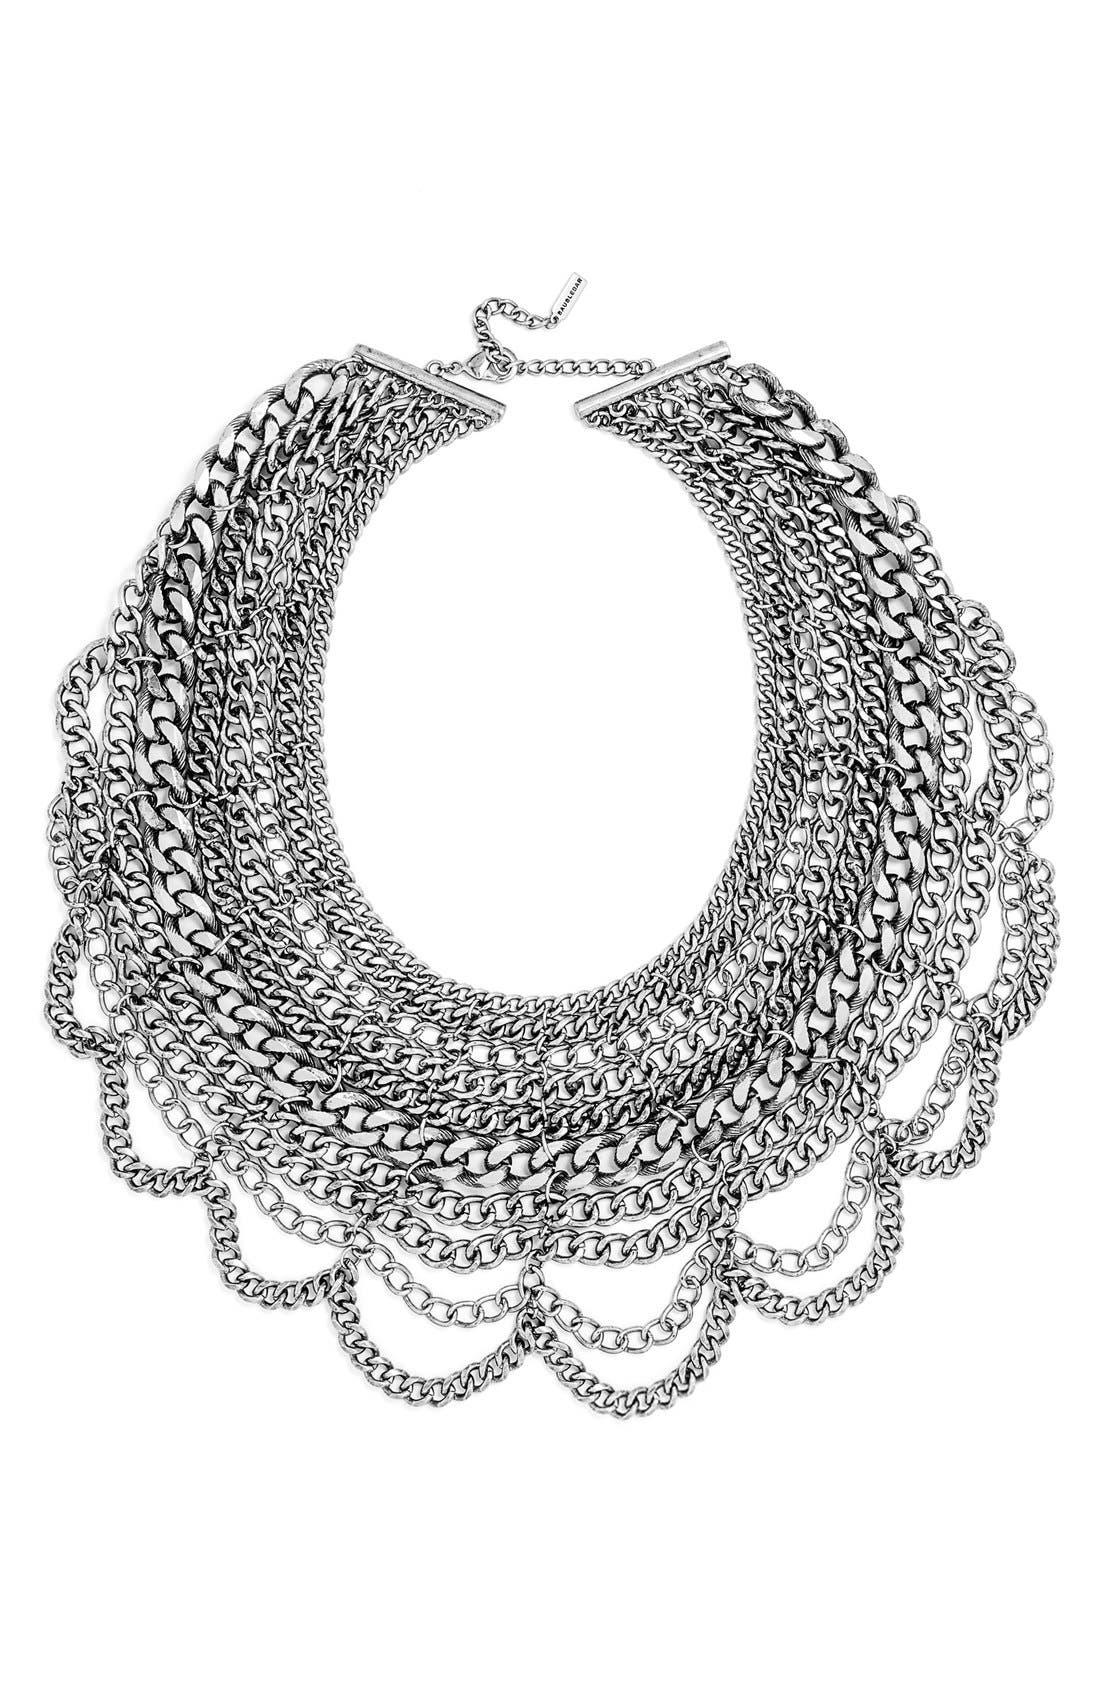 Main Image - BaubleBar 'Courtney' Bib Necklace